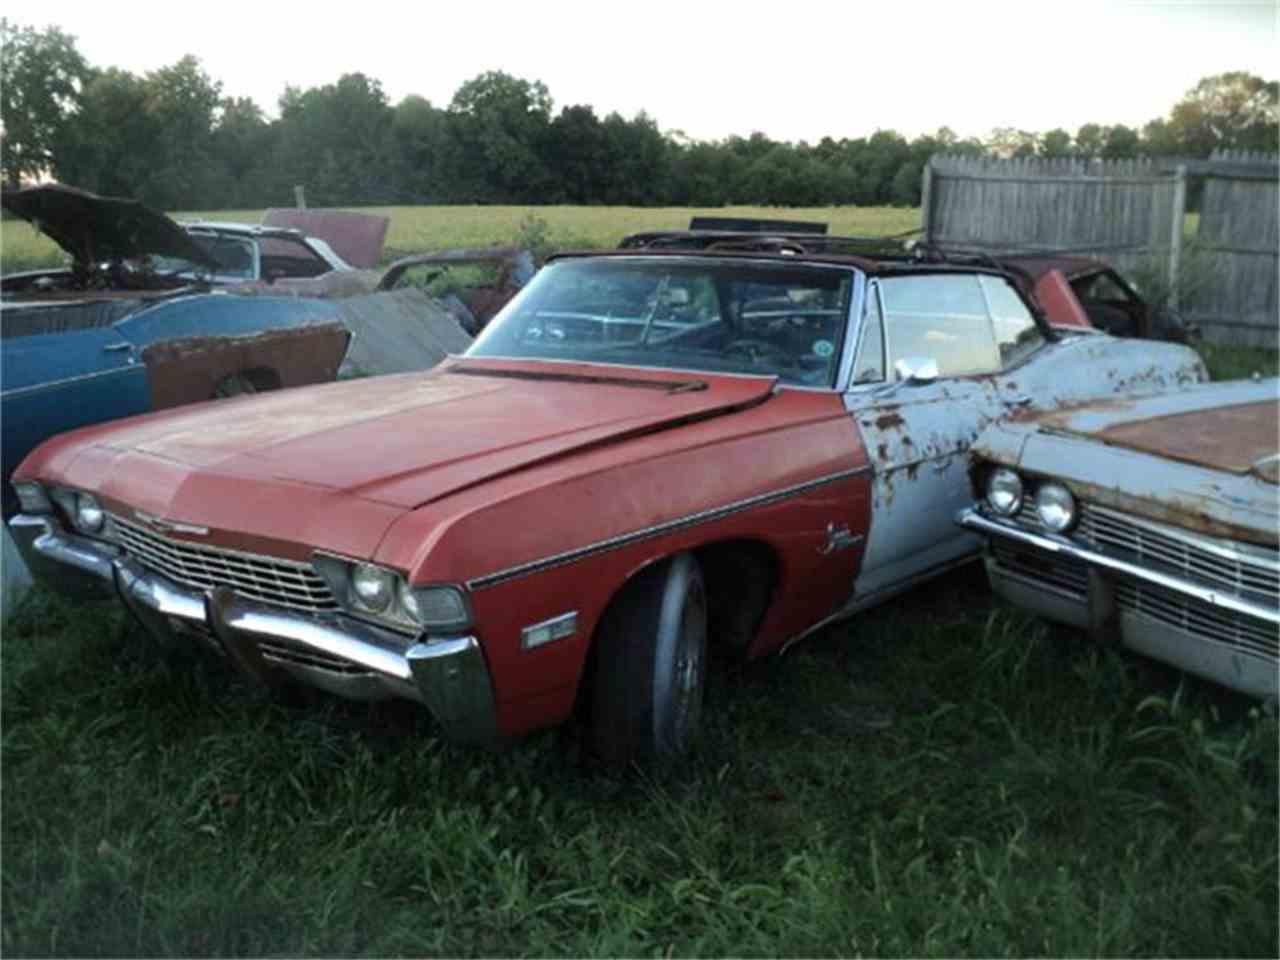 Large Picture of 1968 Chevrolet Impala located in Ohio - $1,500.00 - 7P9E